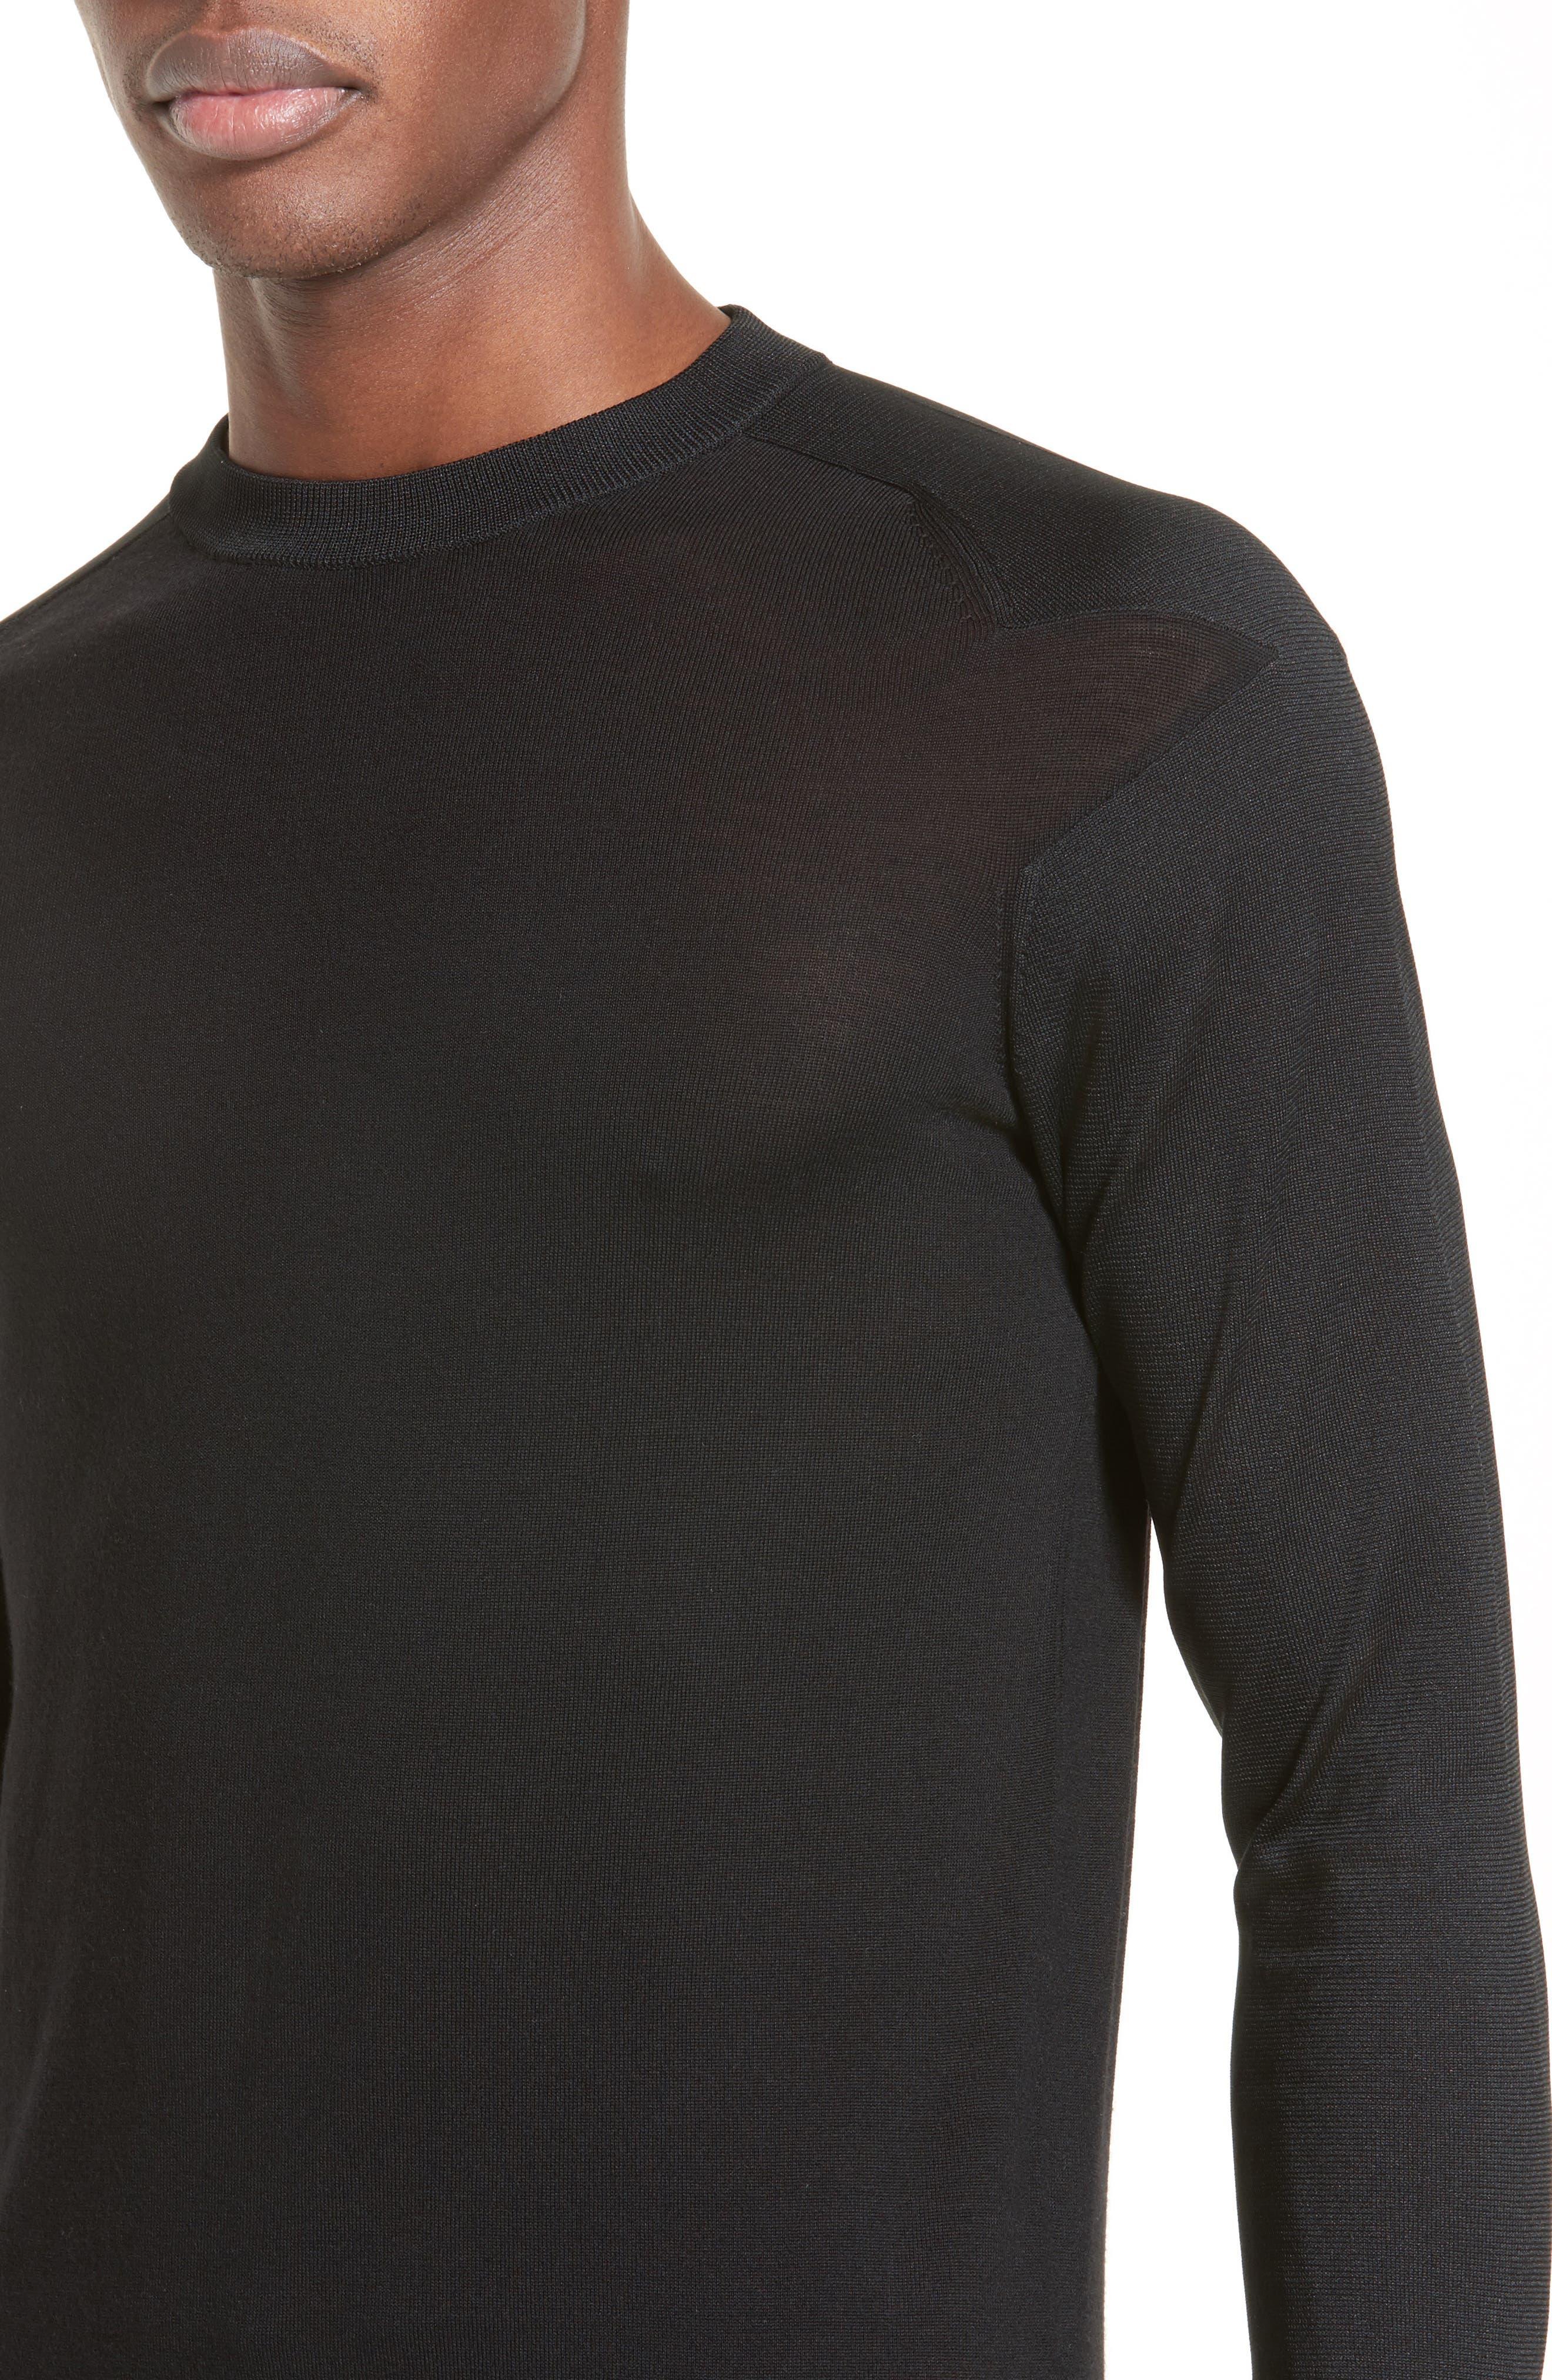 Star Shoulder Sweater,                             Alternate thumbnail 4, color,                             001